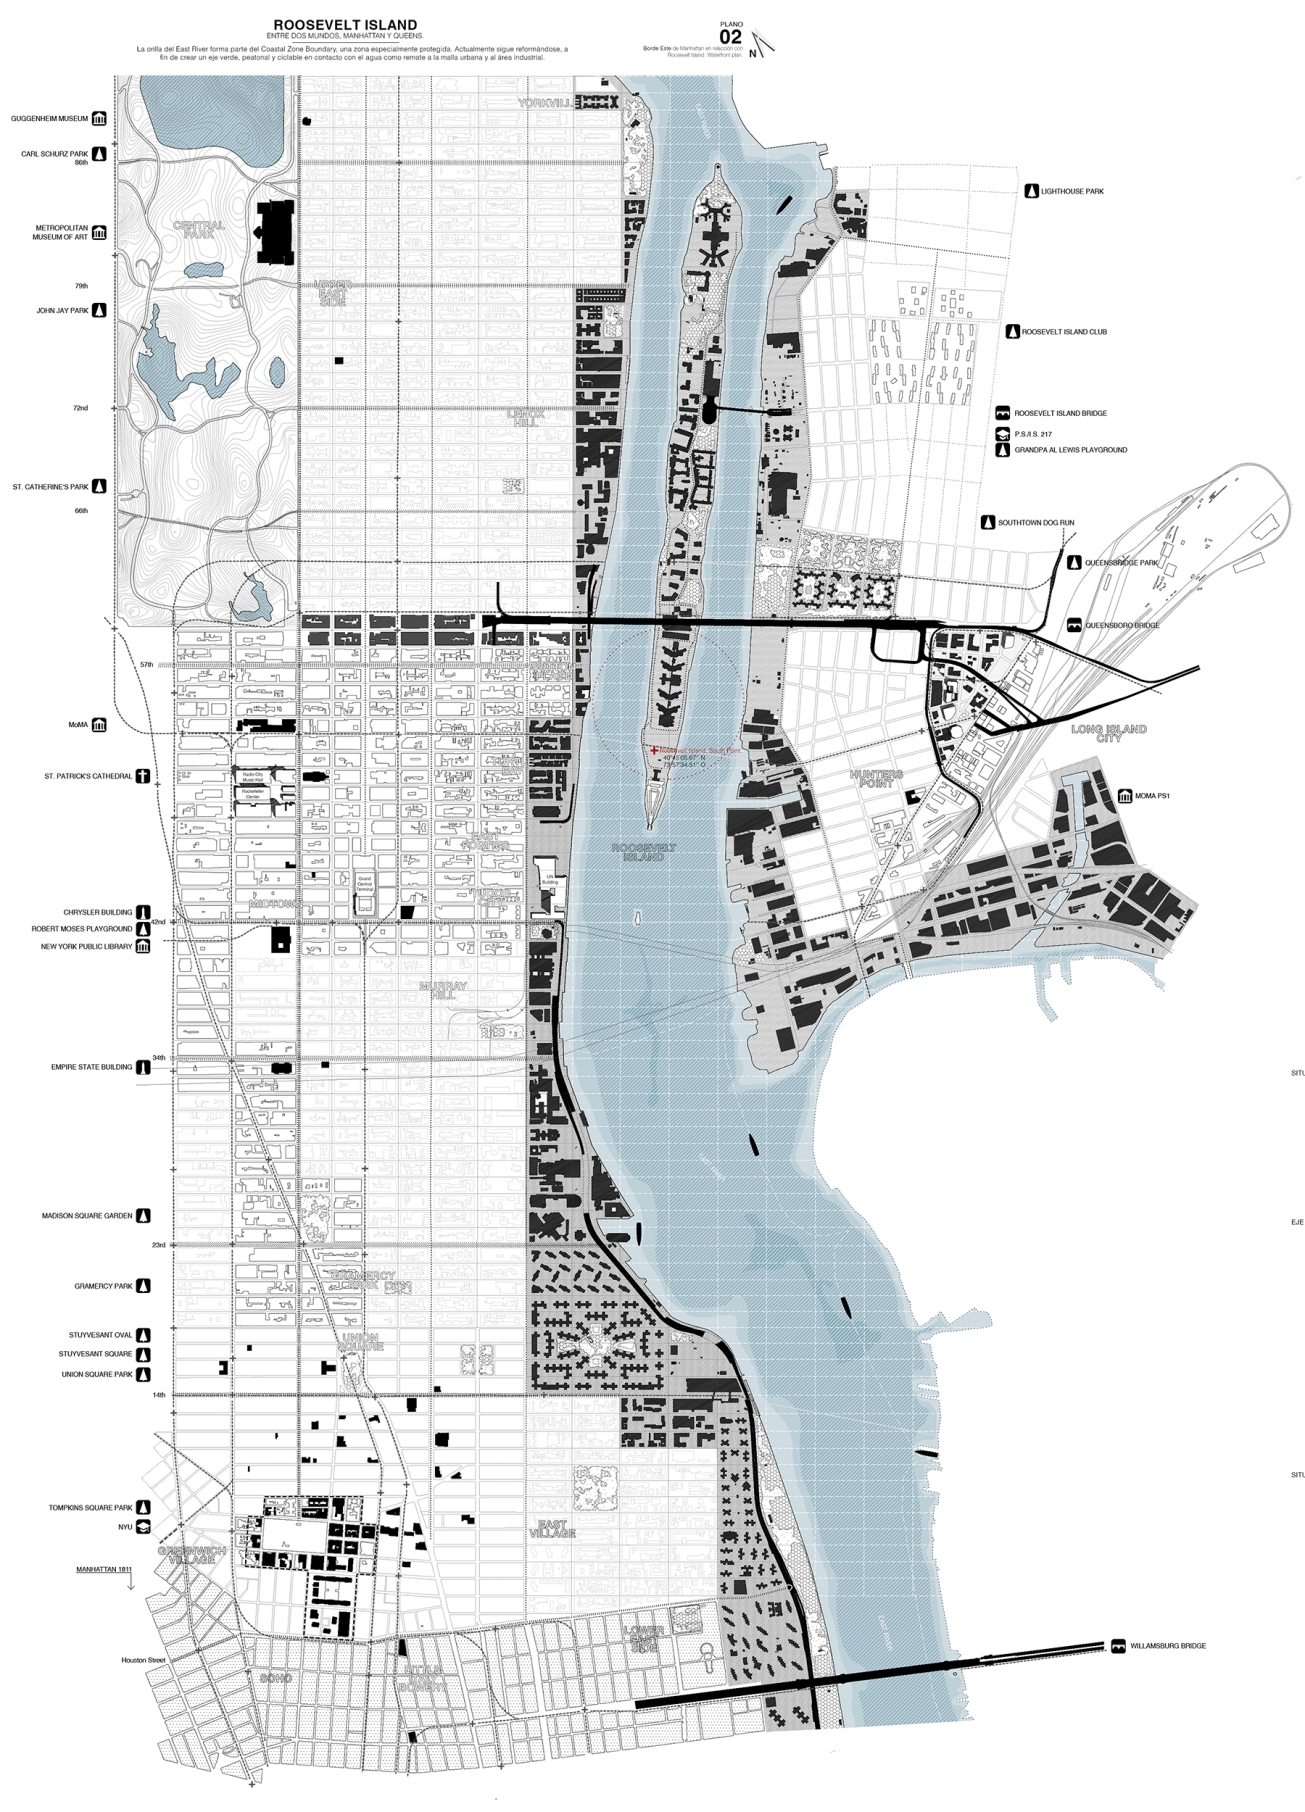 02_East-River-plan_Dorian-Manhattan_Alex-Duro_2015_Final-Thesis_Architecture-School-Alcala.jpg